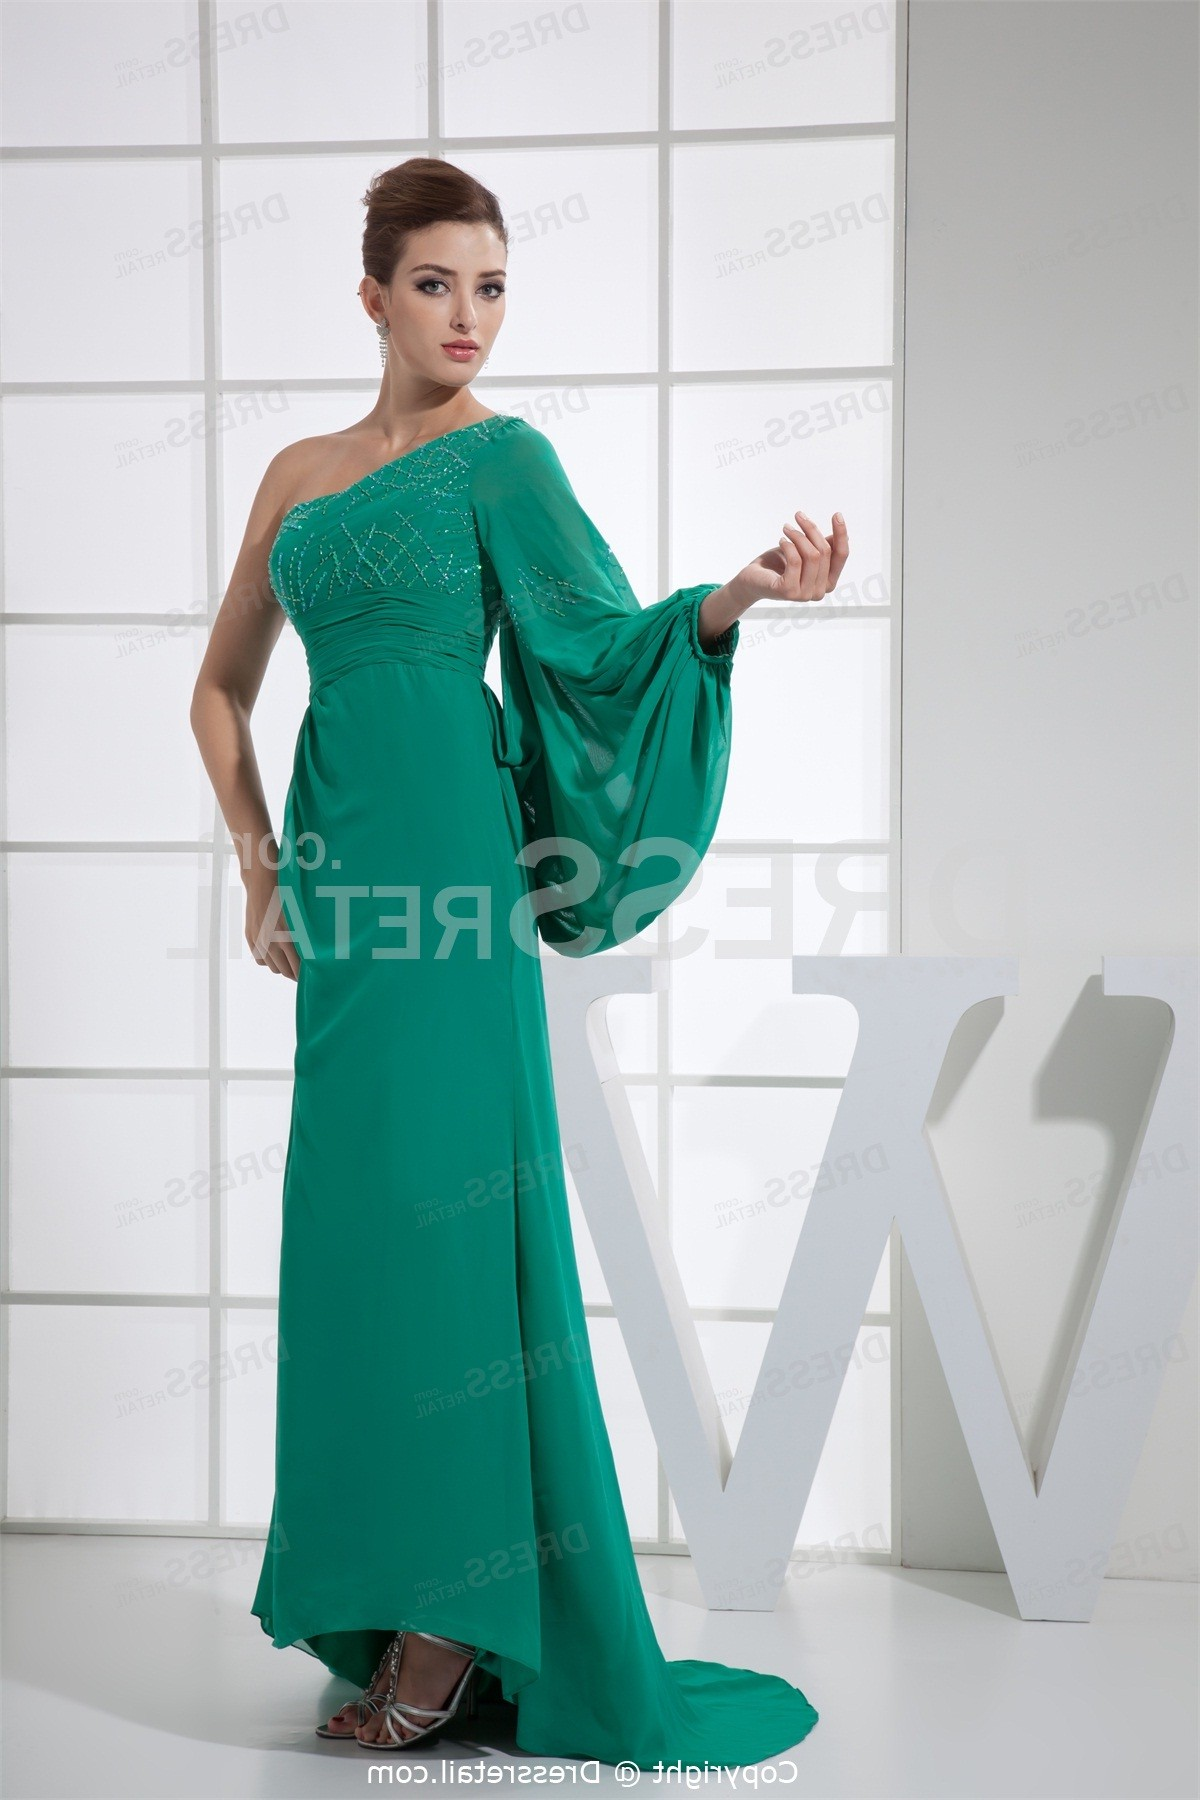 belks dresses for wedding guest photo - 1